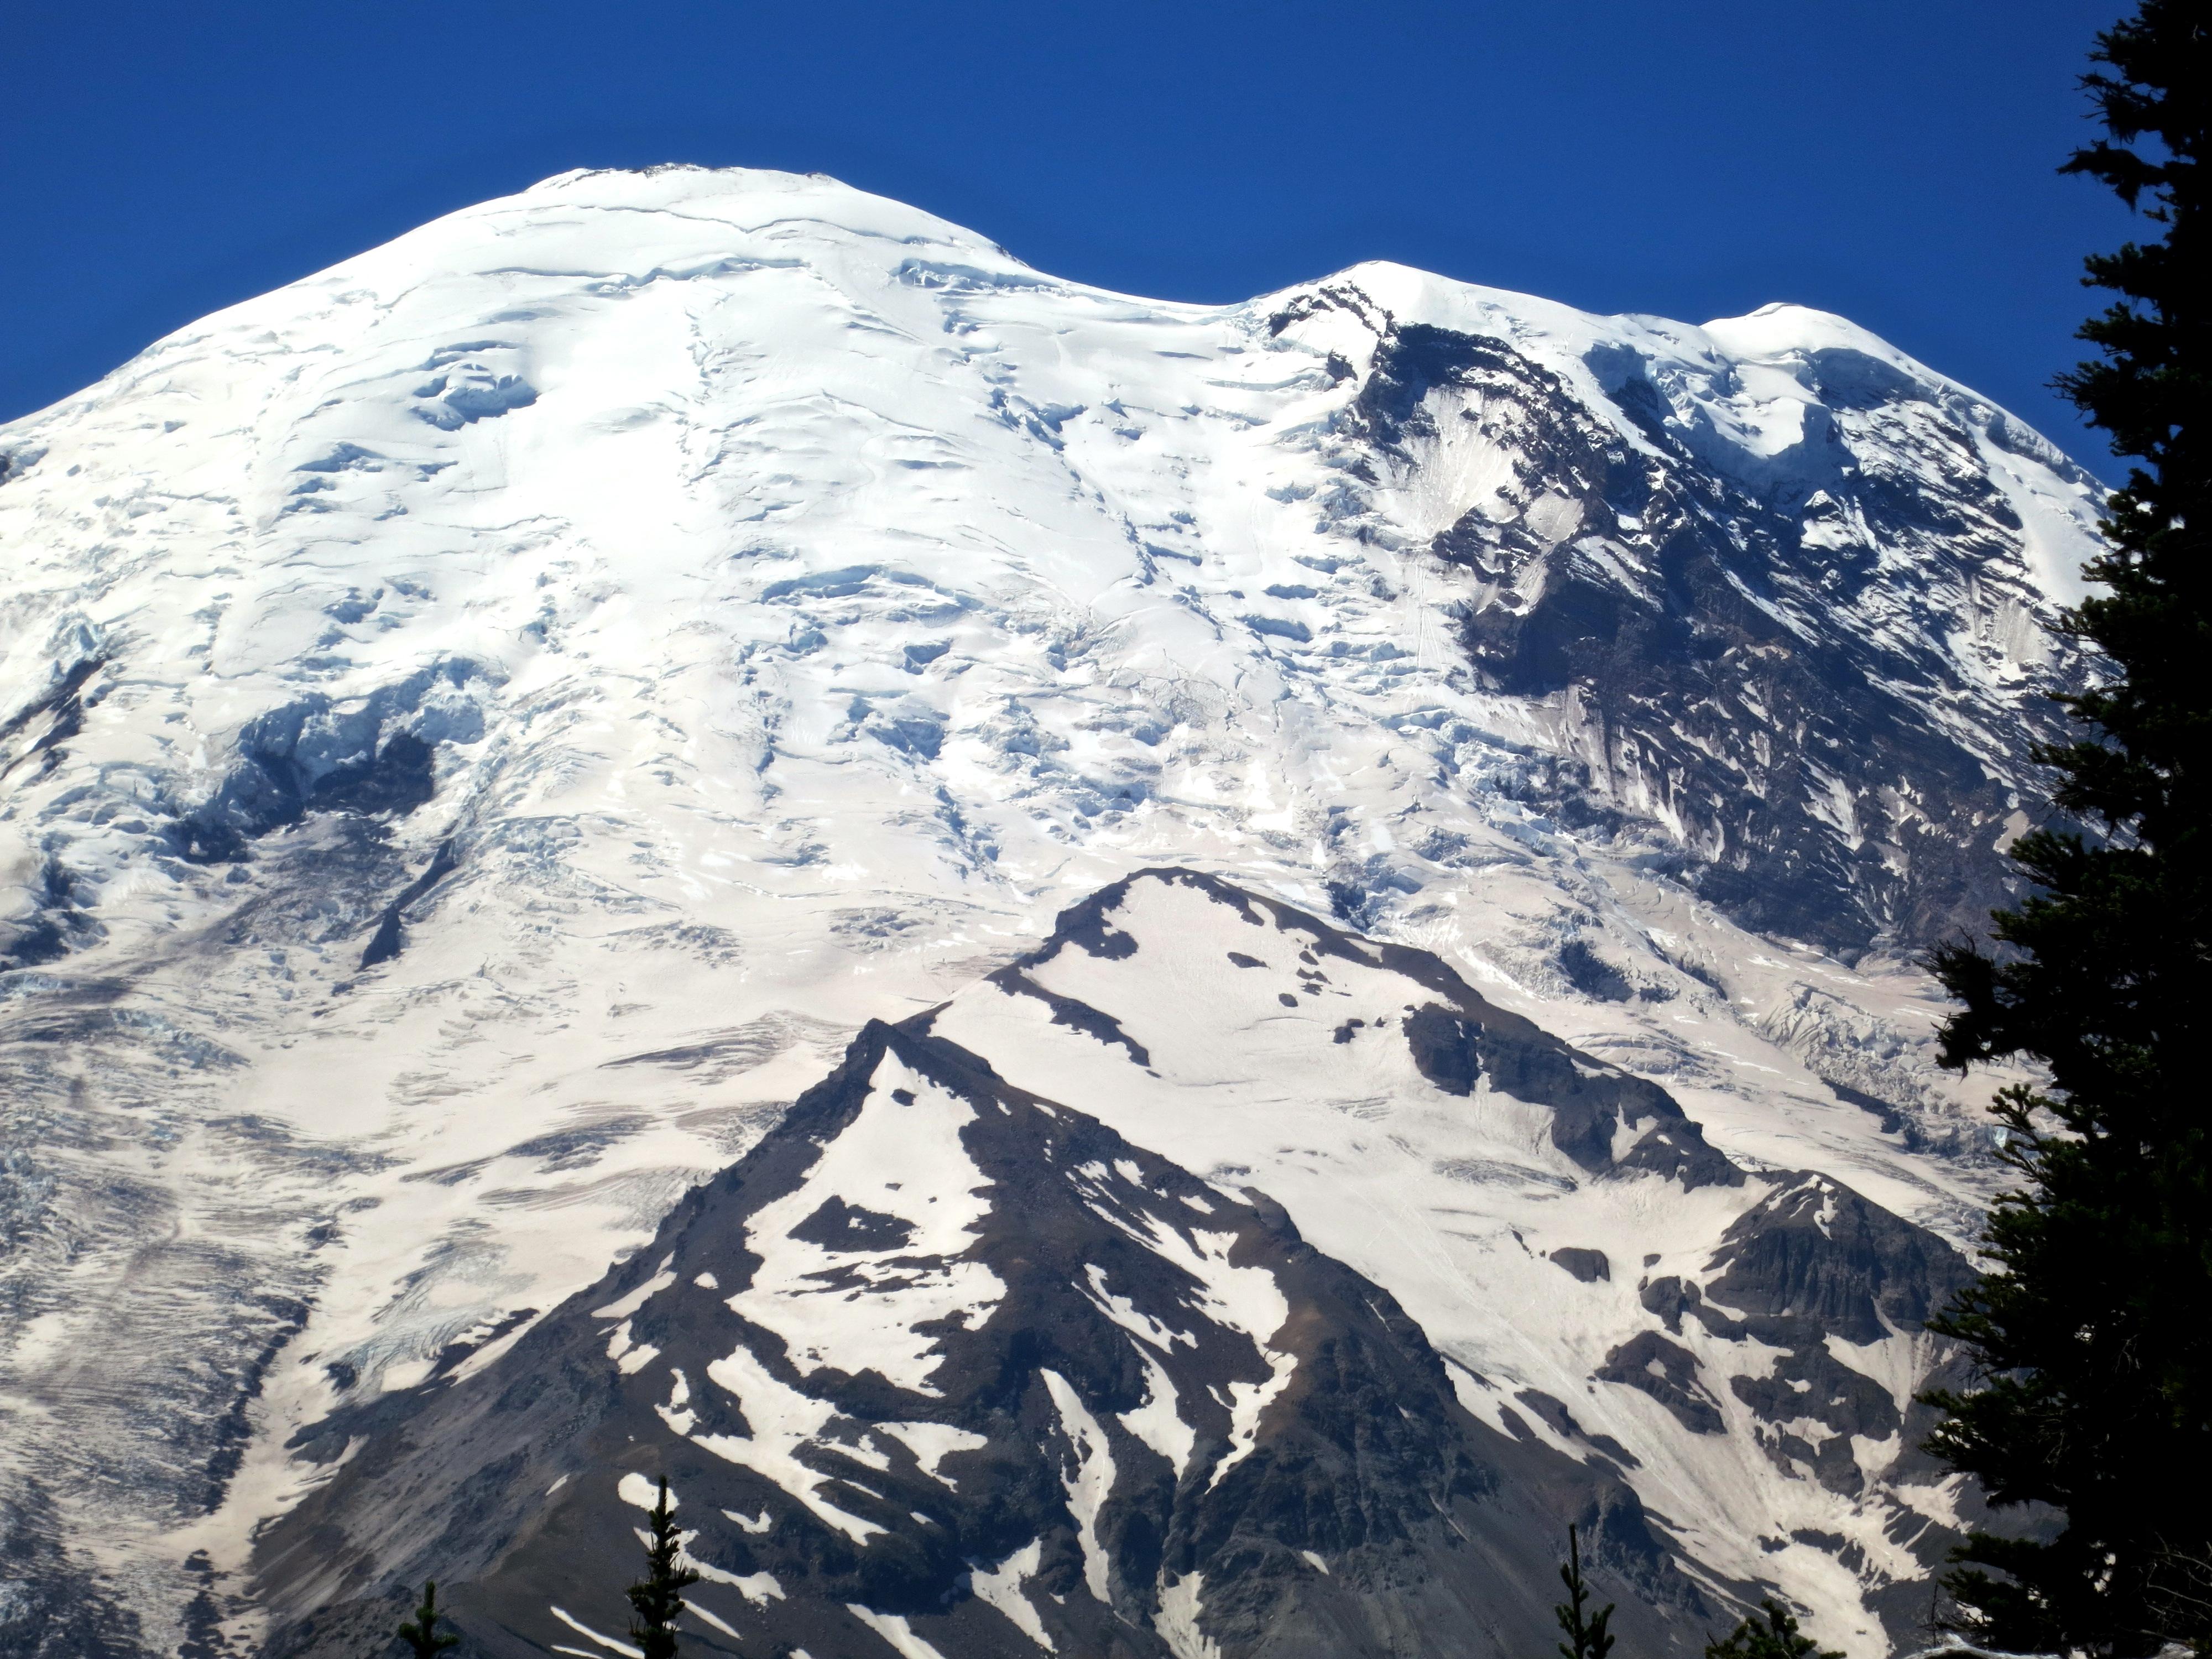 Close-up of Emmons Glacier at Mt Rainier National Park. Photo by Curtis Mekemson.